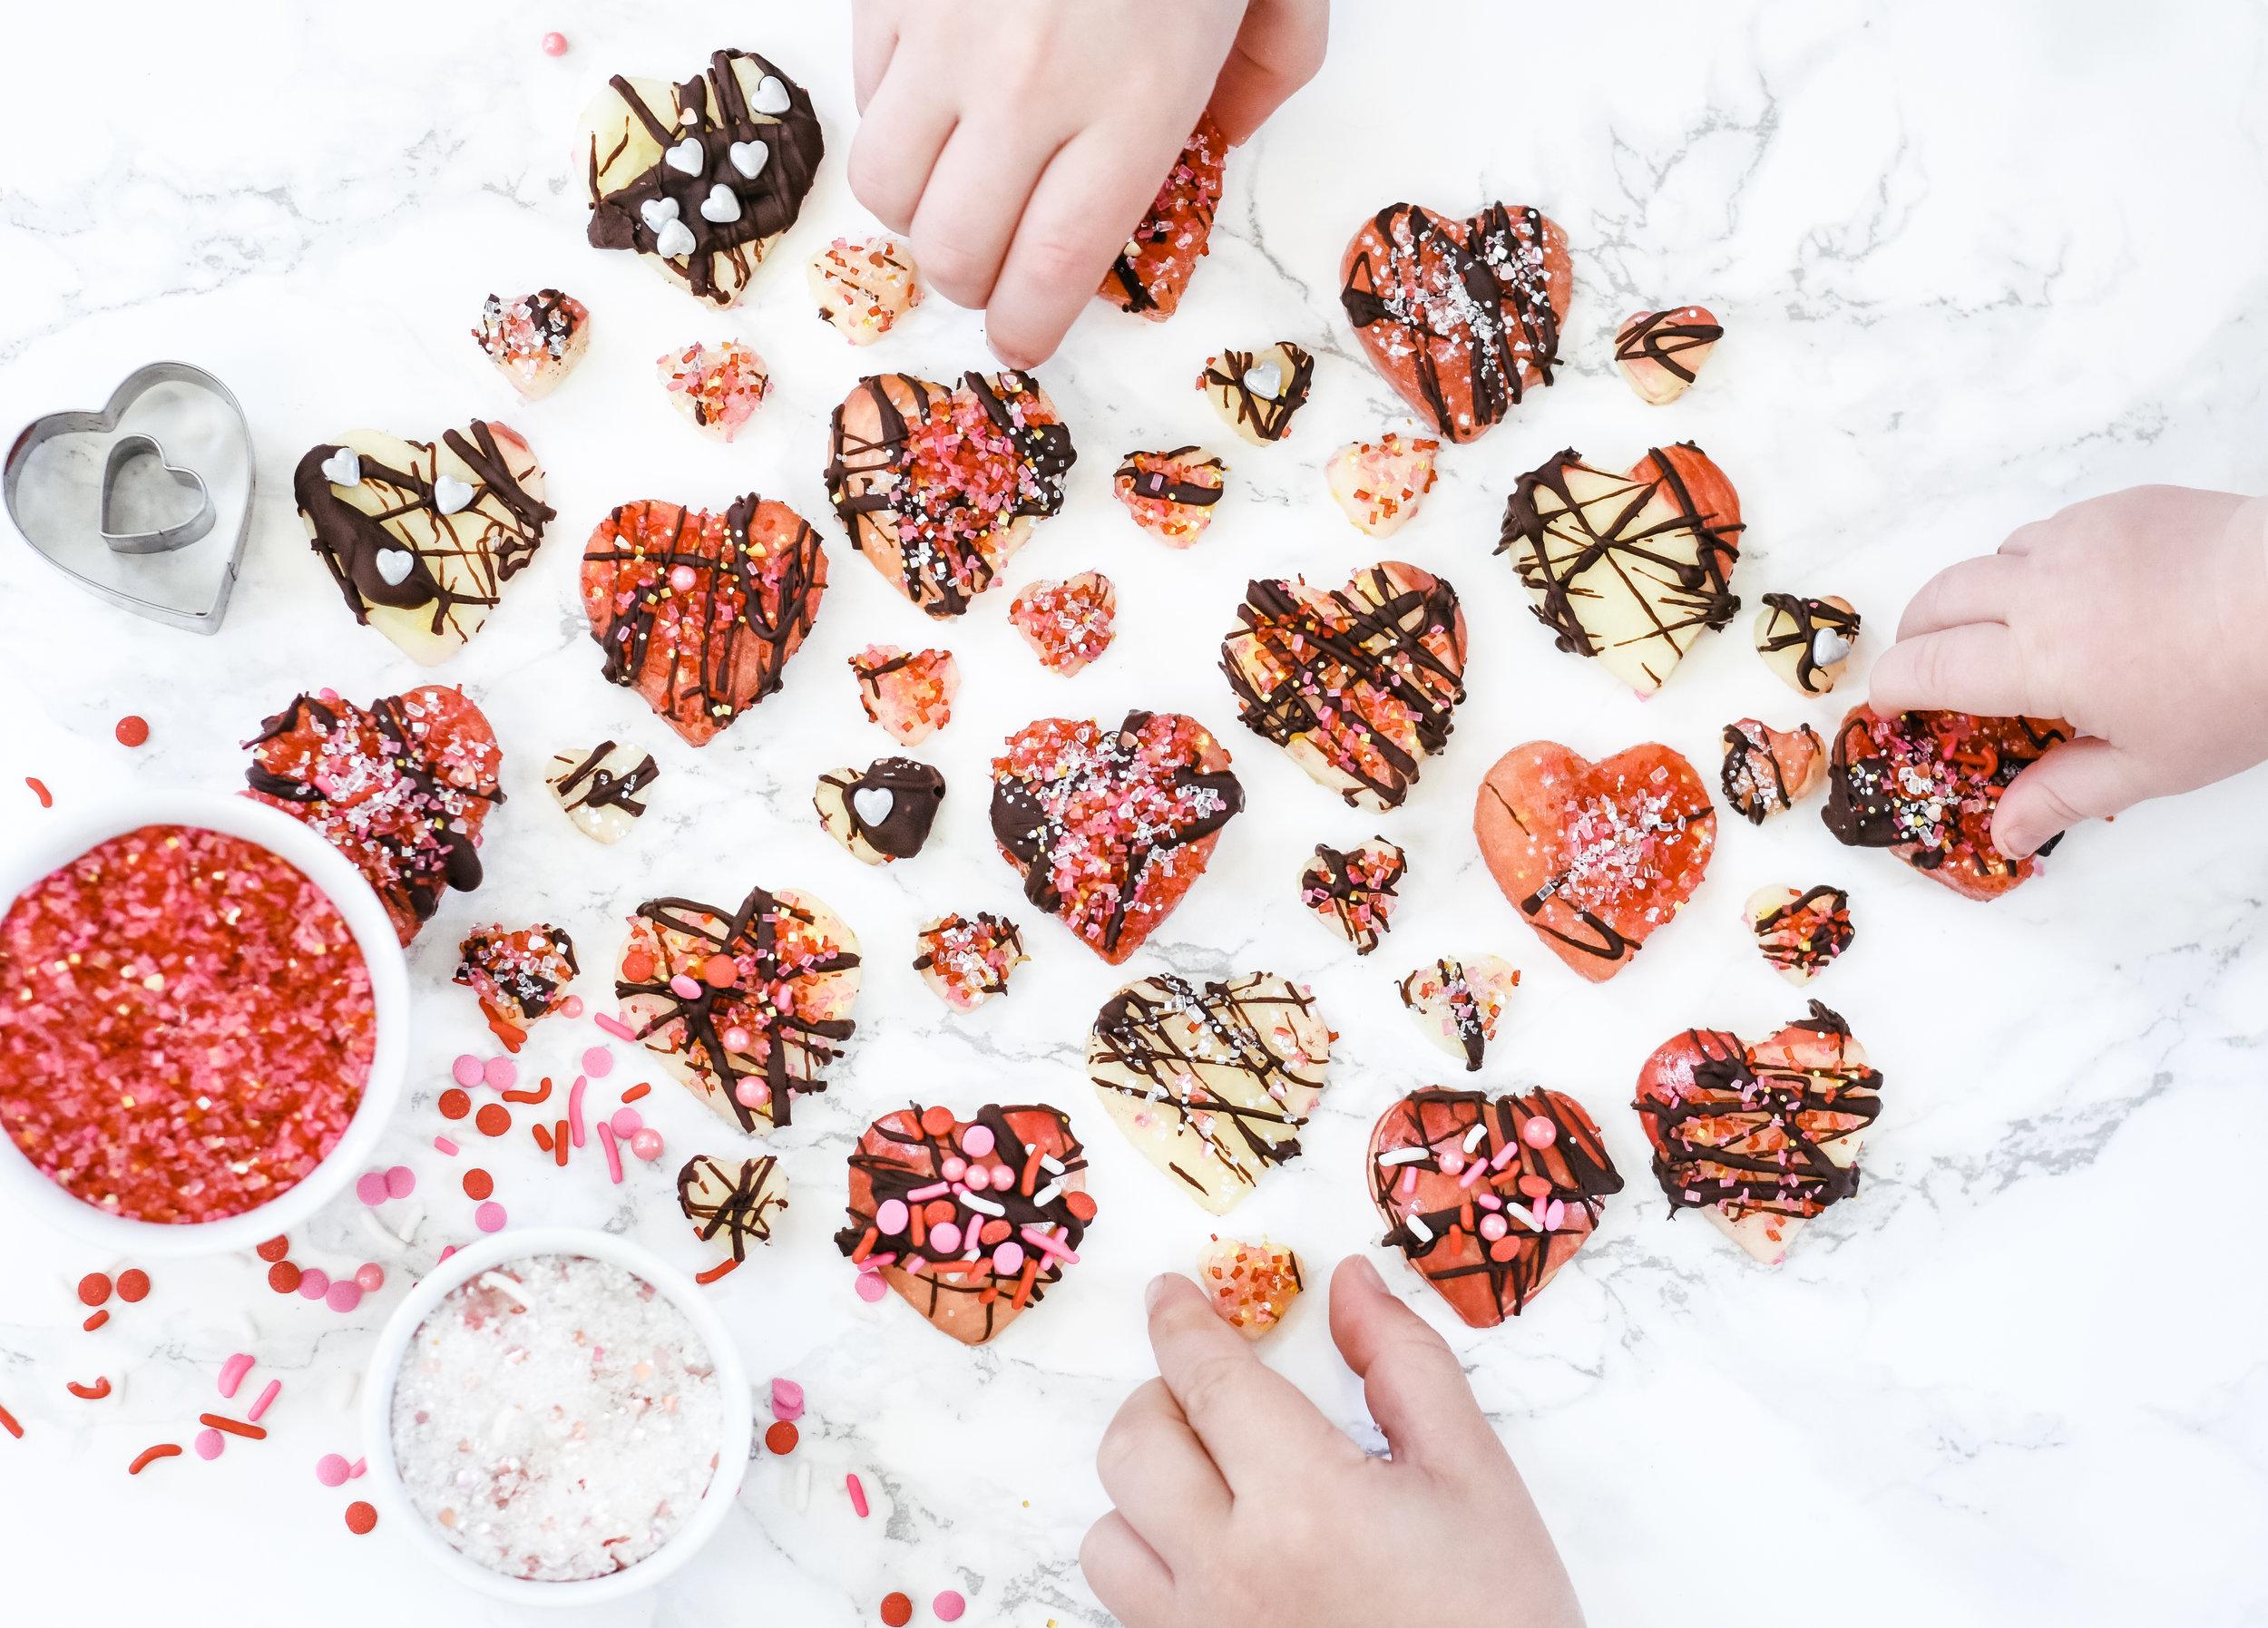 Enjoy Life A Valentine's Chocolate Apples LL & Co. -9.jpg